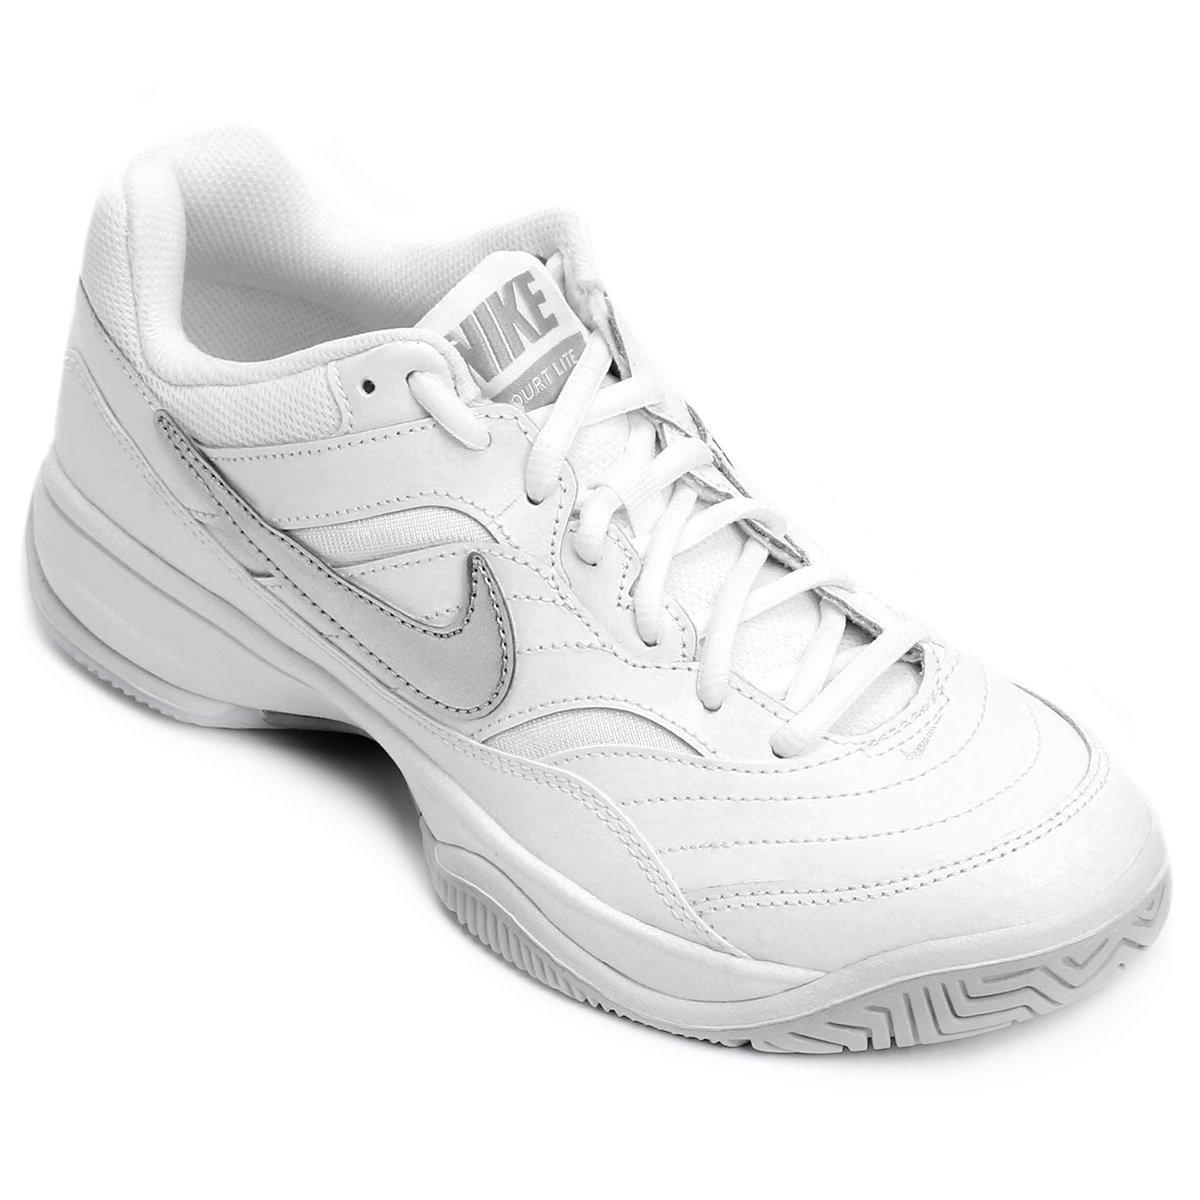 Tênis Nike Wmns Nike Court Lite Feminino - Branco e prata - Compre ... c2df99bcbf51a